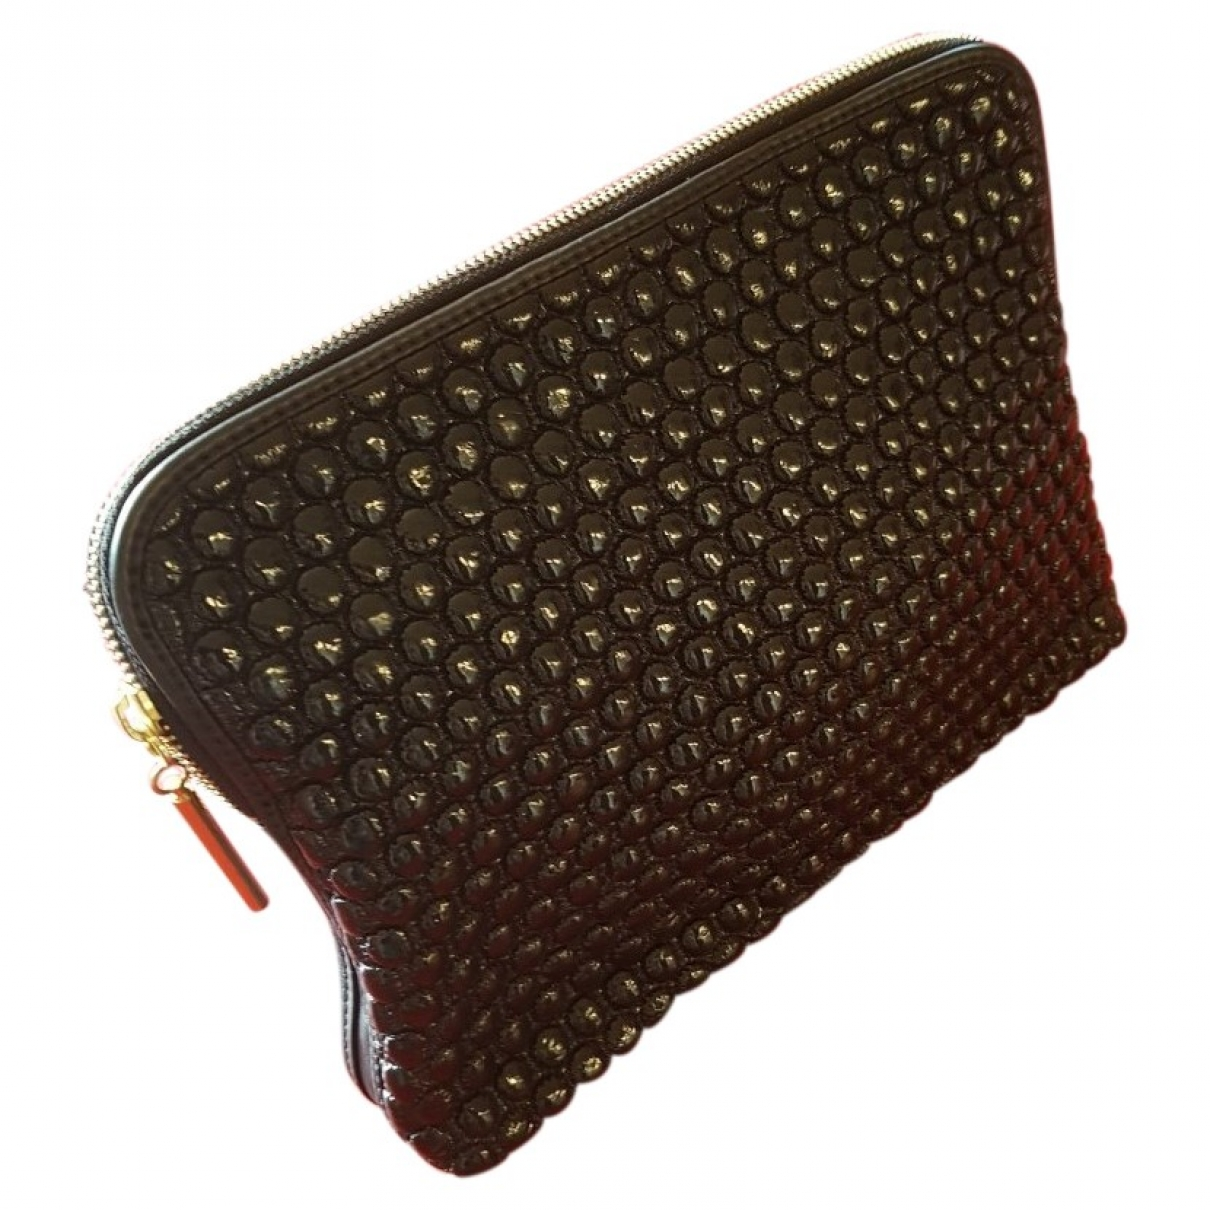 3.1 Phillip Lim \N Black Leather Clutch bag for Women \N